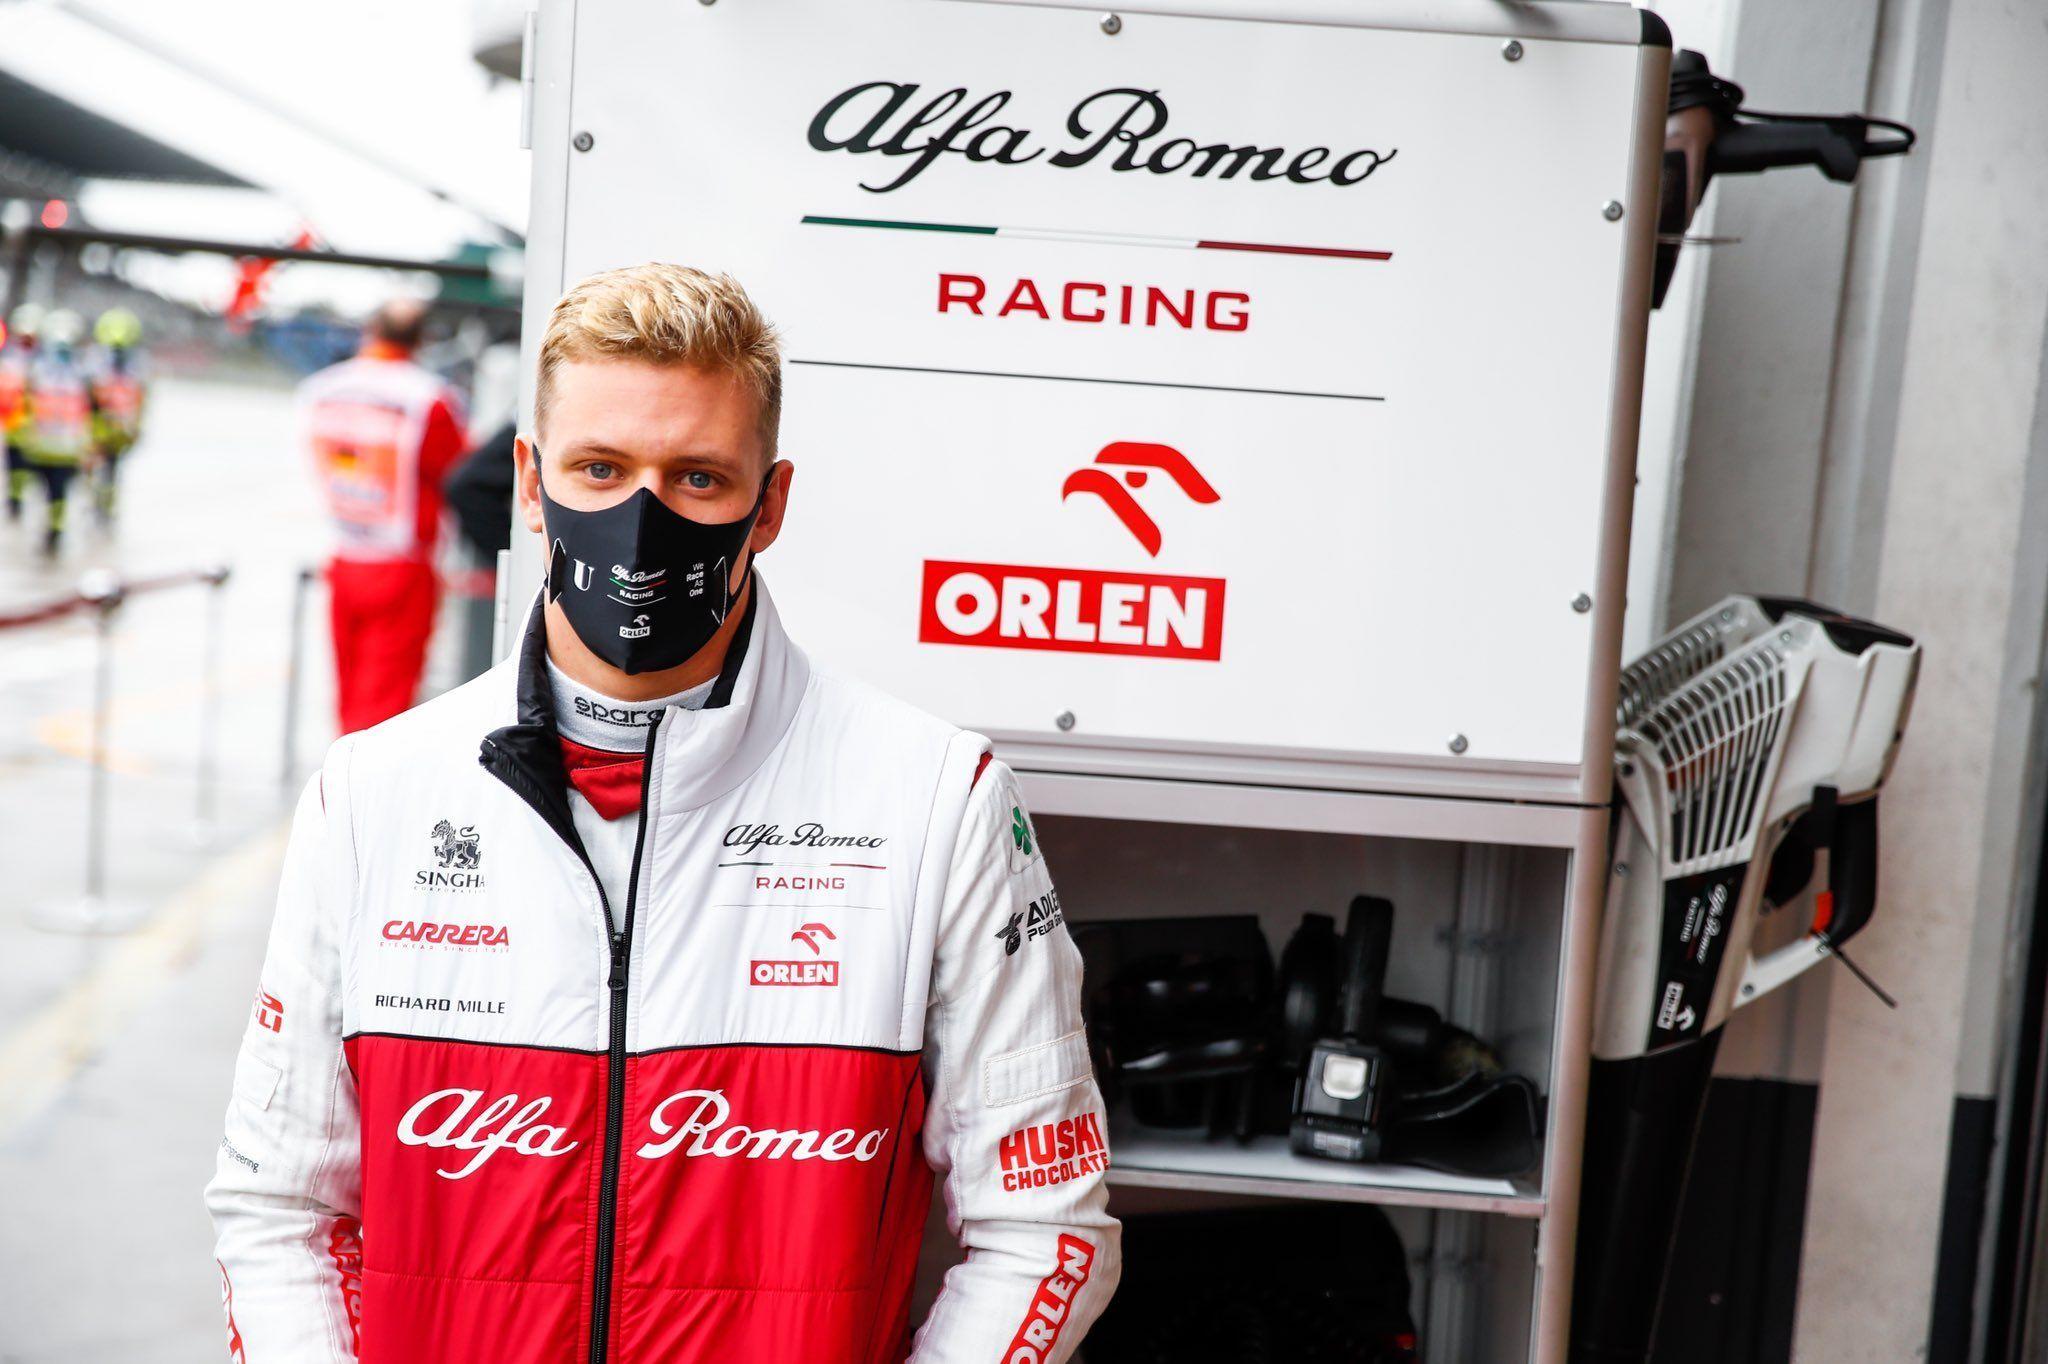 F1, Mick Schumacher, Callum Ilott